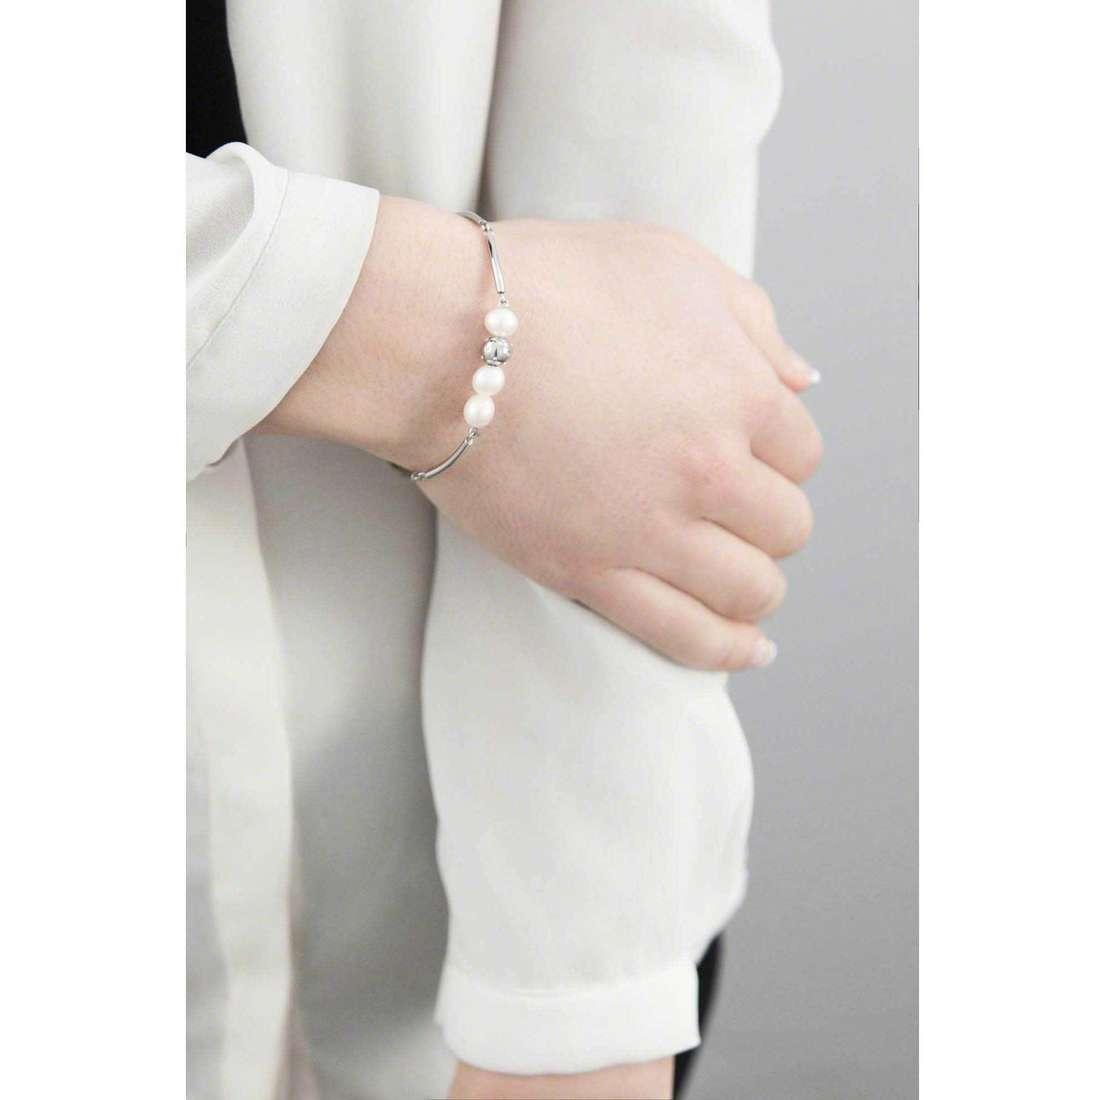 Morellato bracelets Lunae femme SADX12 indosso